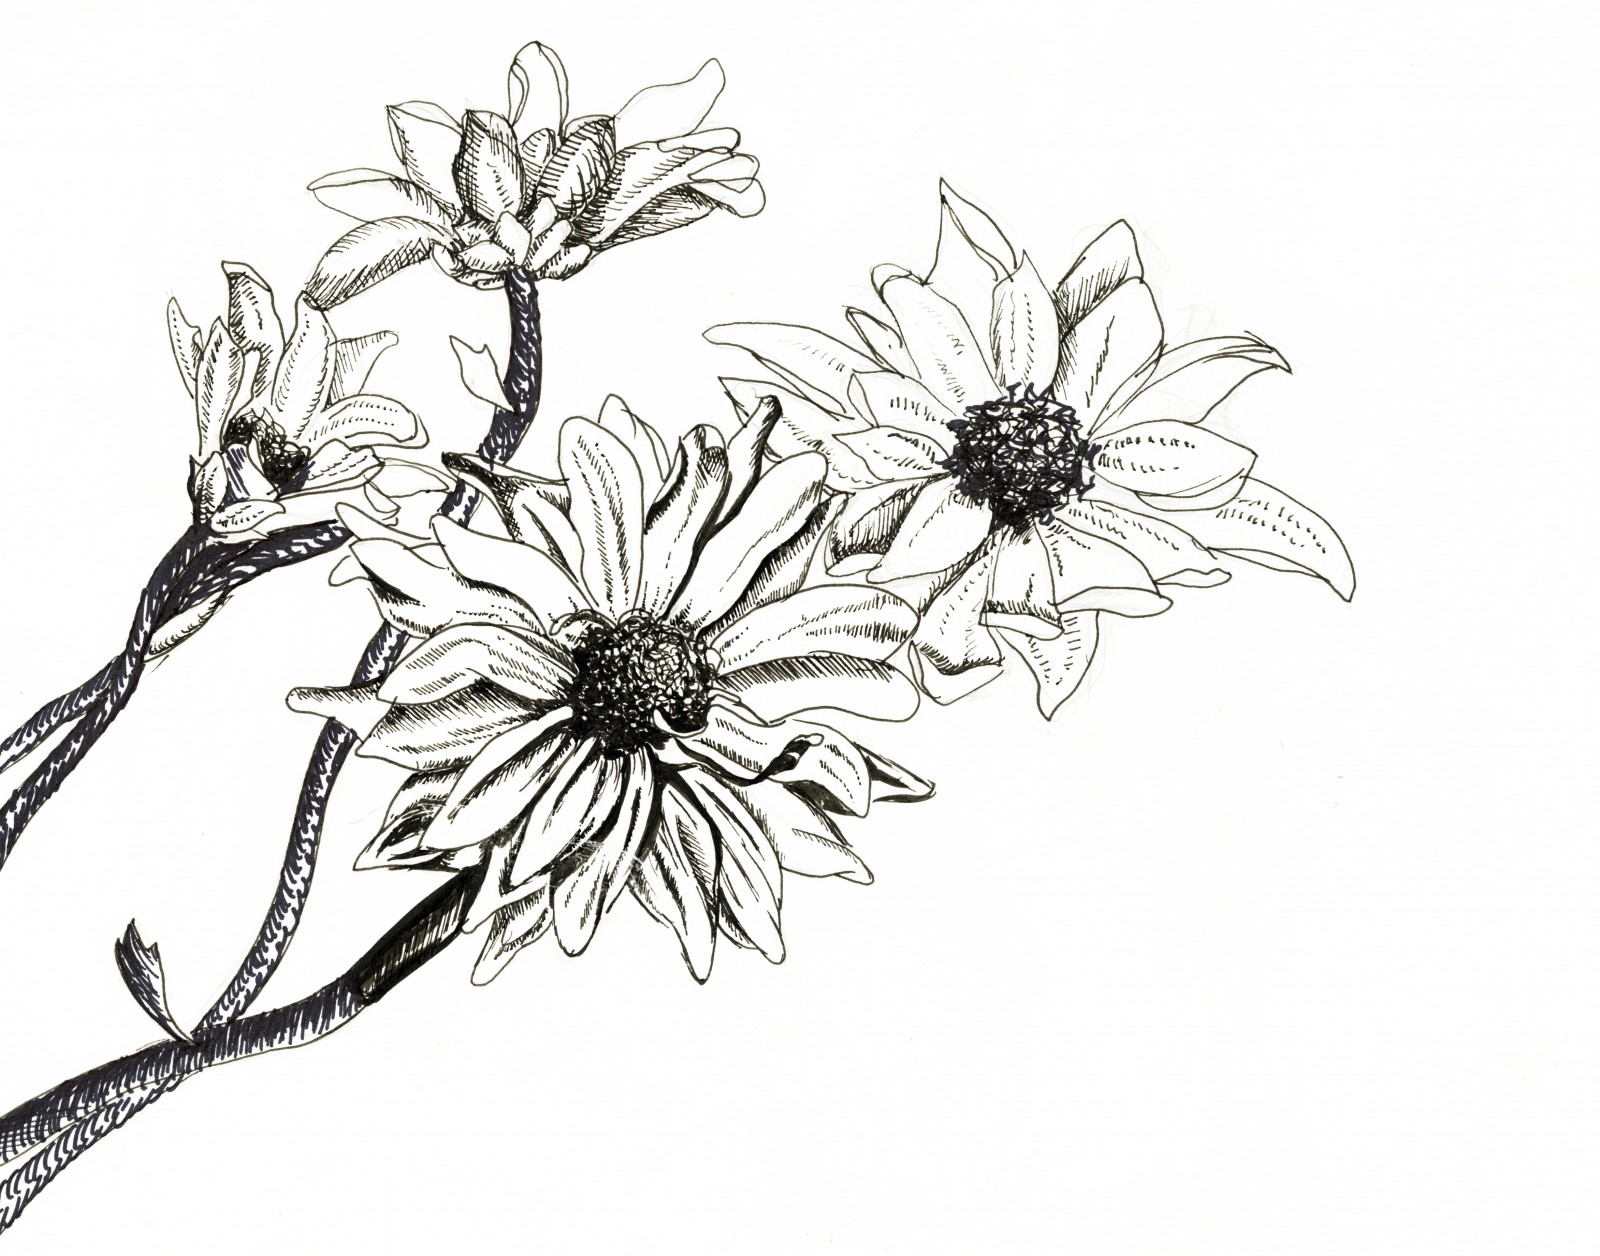 Gerbera daisy flower drawing flowers healthy gerbera daisy drawing at getdrawings free for personal use izmirmasajfo